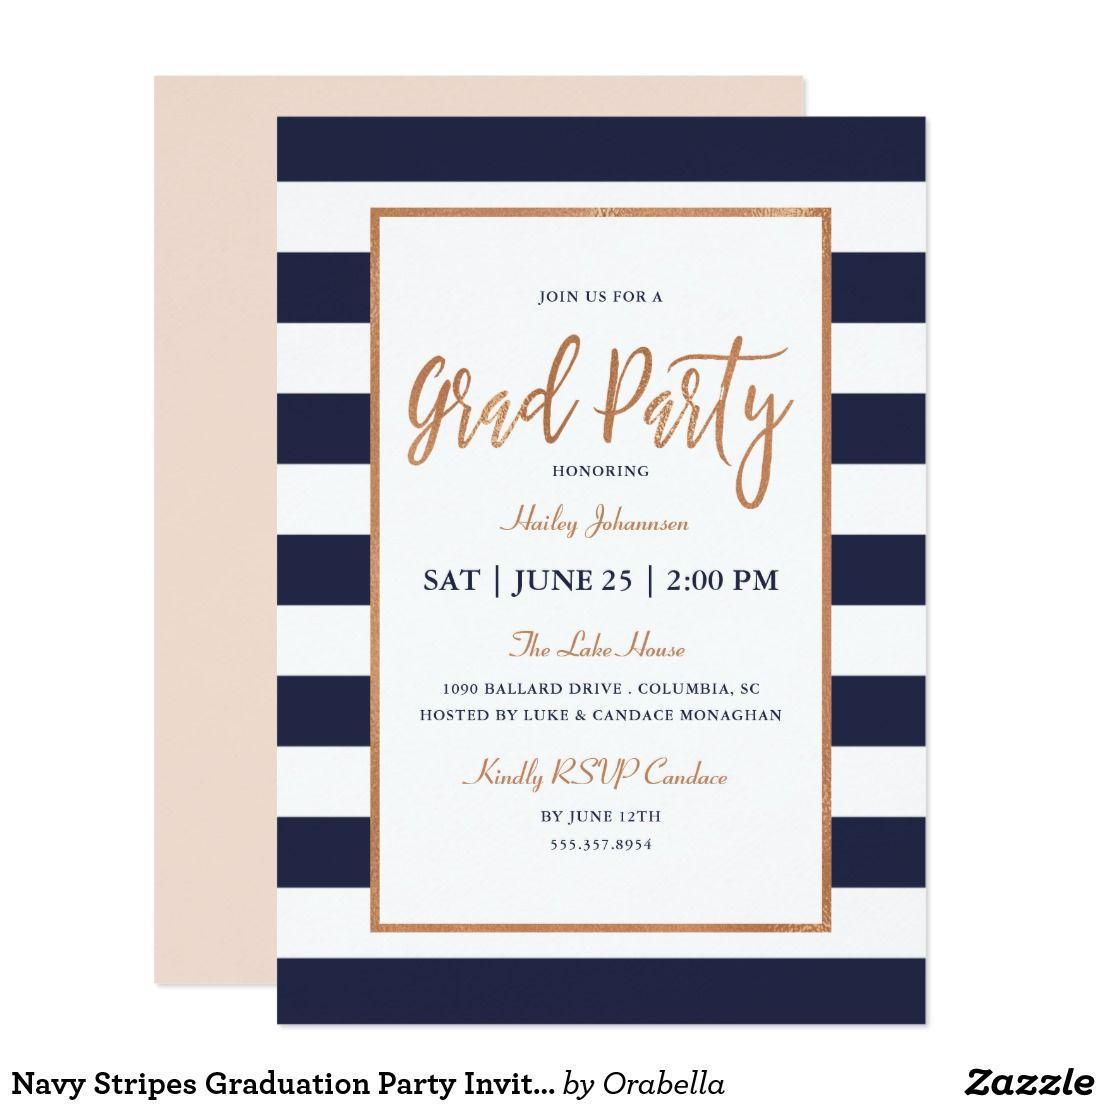 Navy stripes graduation party invitation congrats grads navy stripes graduation party invitation modern stylish graduation party invitations featuring faux rose gold foil filmwisefo